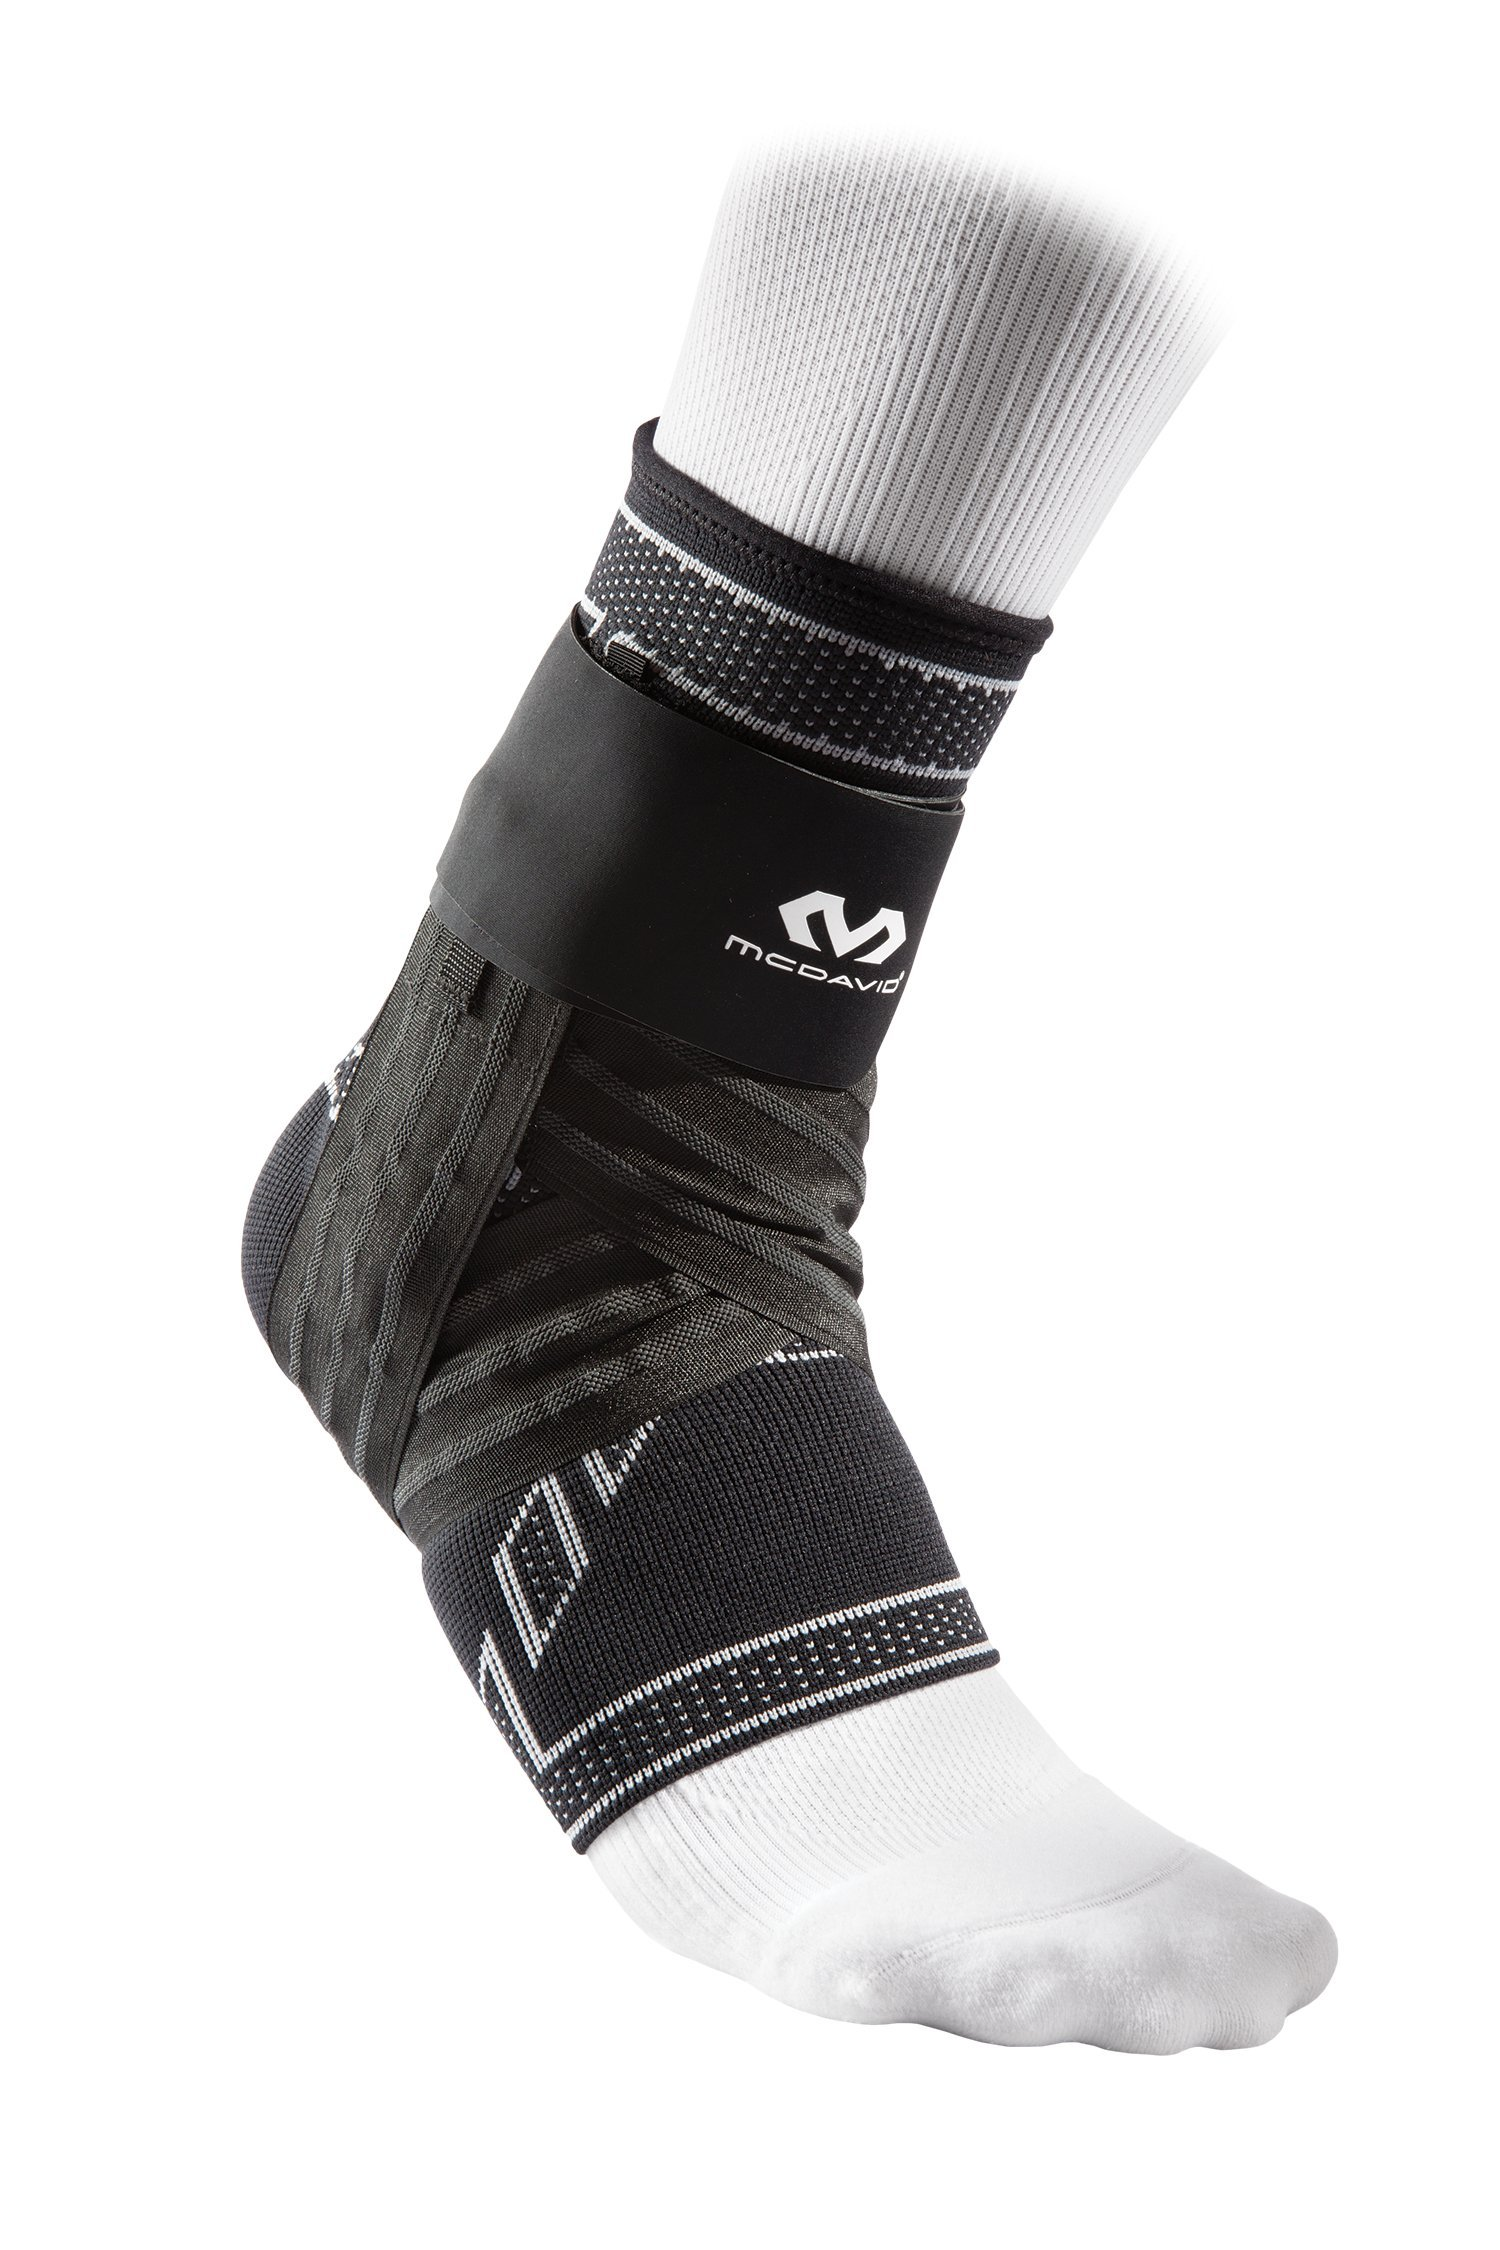 McDavid Elite Engineered Elastic Ankle Brace with Figure 6 Strap & Stays, Black, Large by McDavid